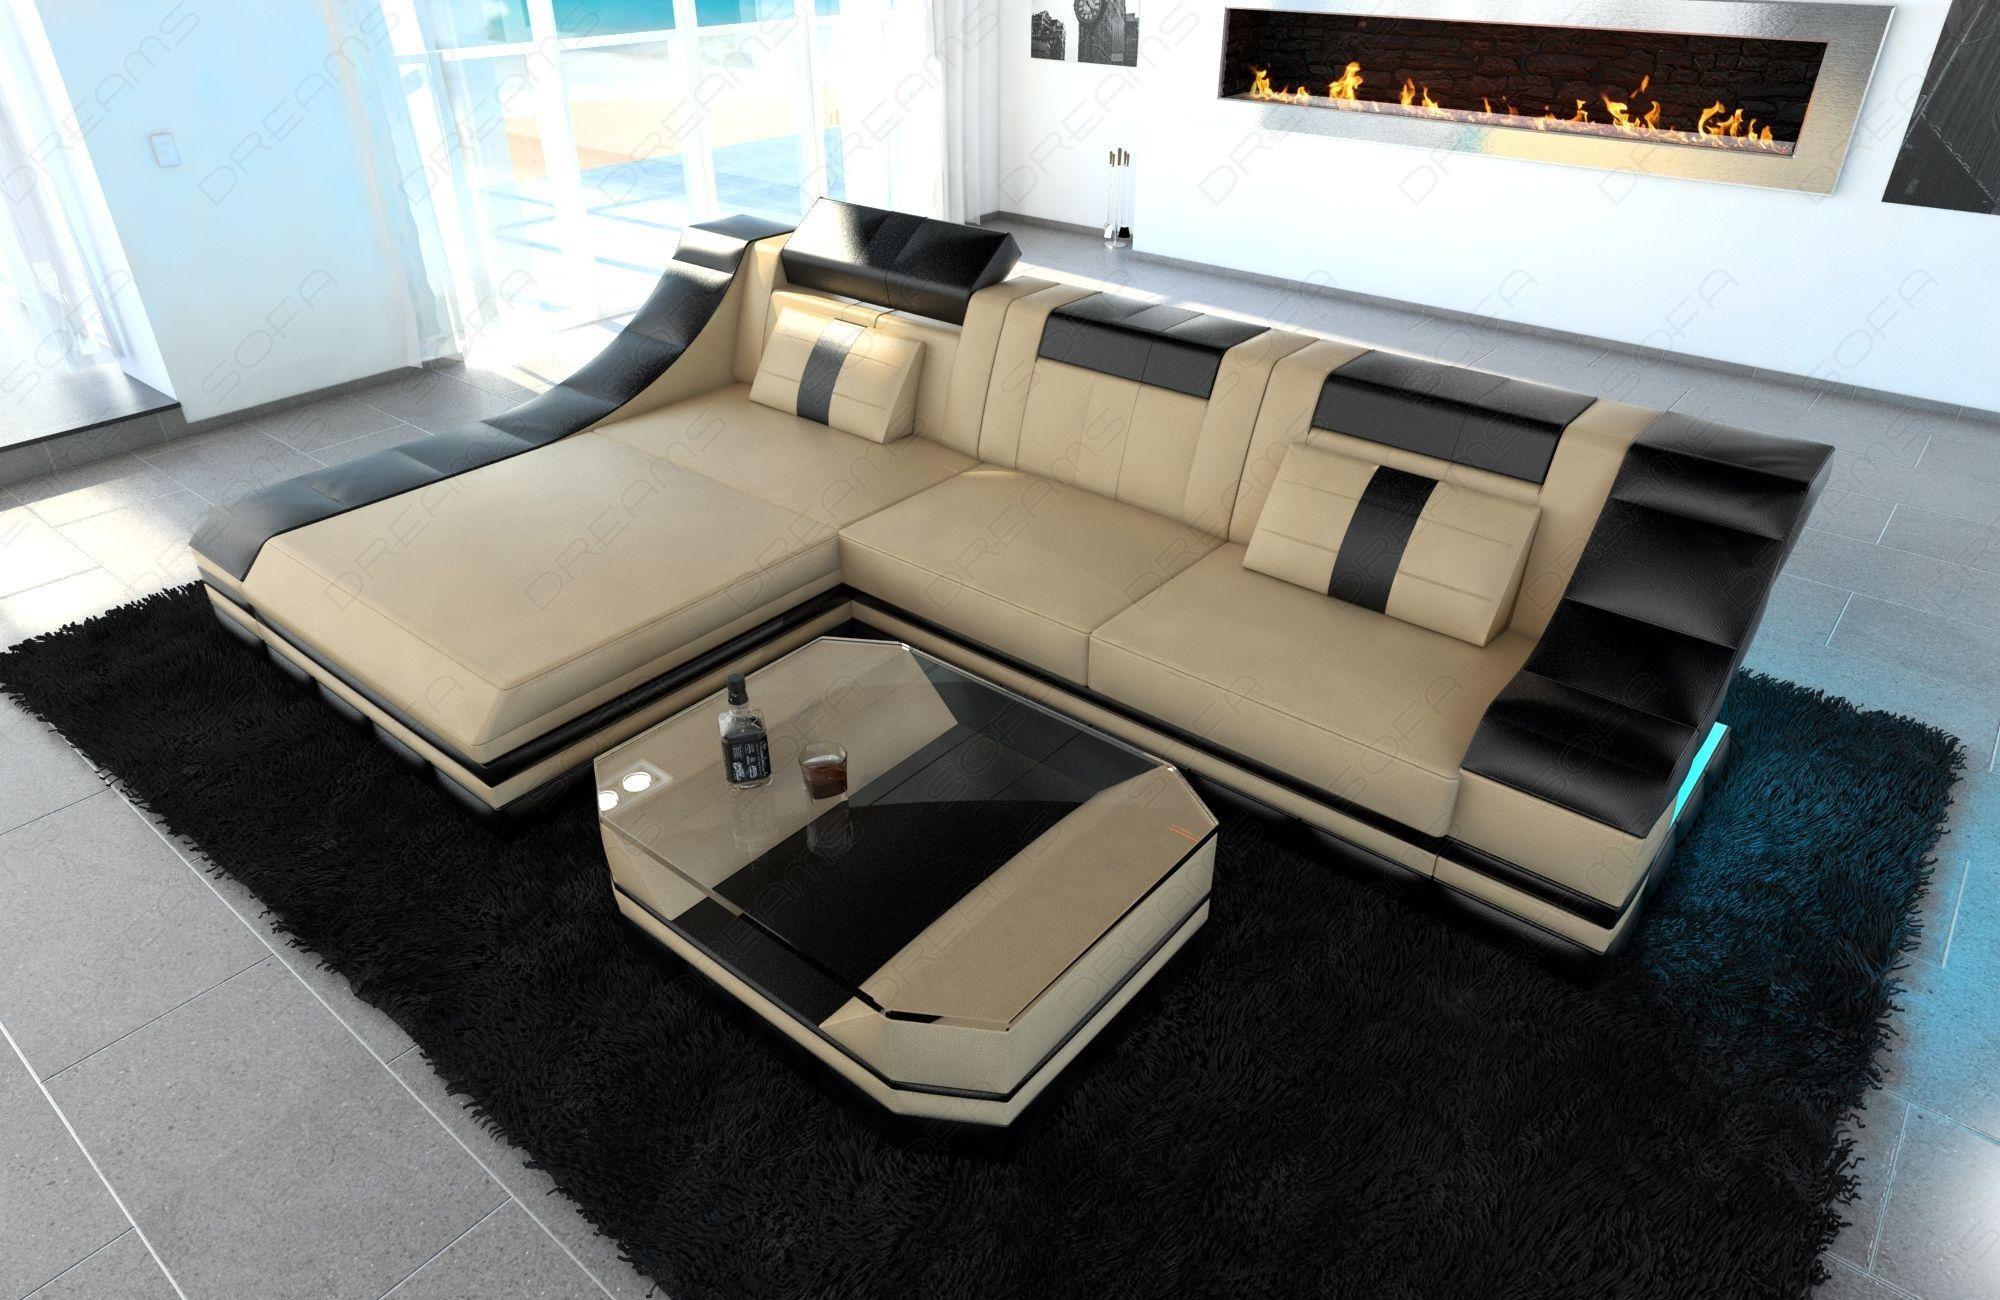 Luxury Sectional Sofa New York L Shape Led Sofadreamsus Sectional Sofa Small Sectional Sofa Leather Sectional